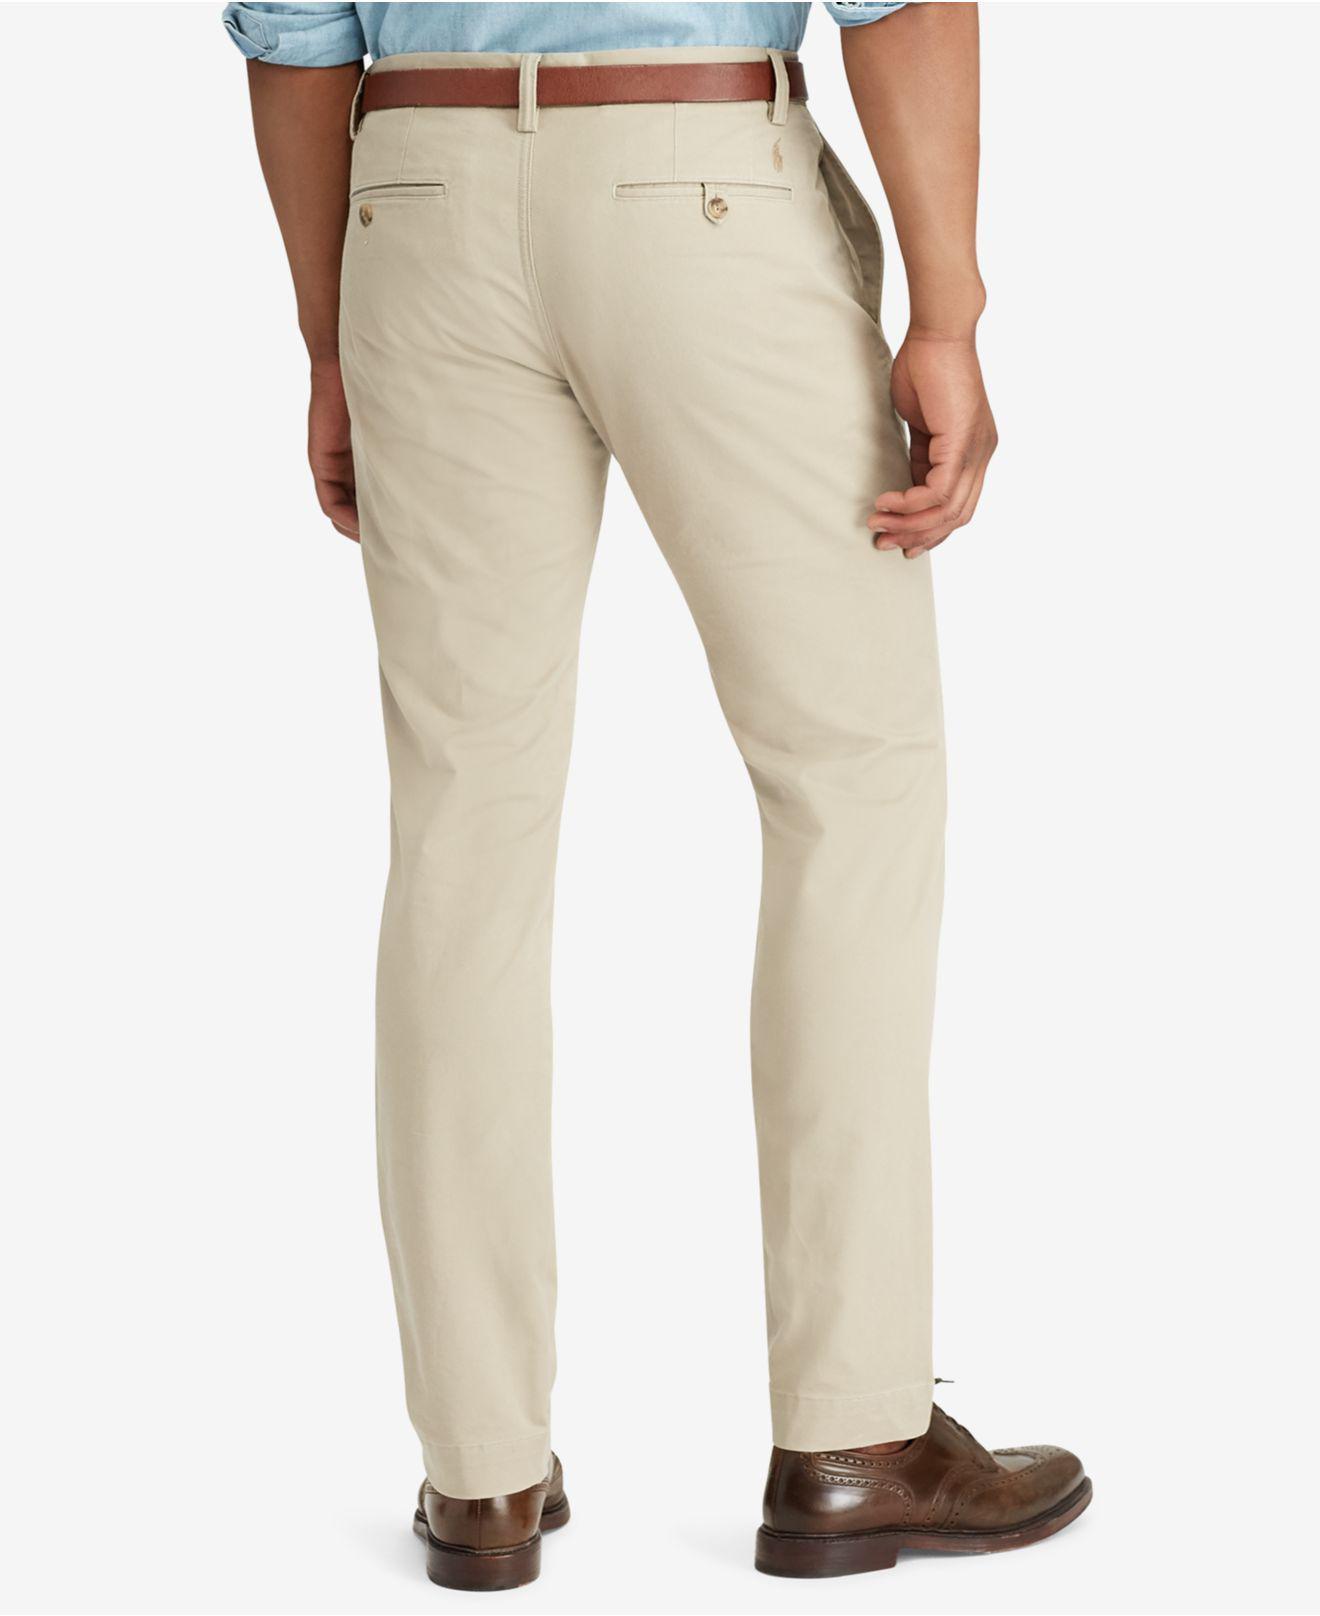 dc20eebb6f88 Lyst - Polo Ralph Lauren Men s Hampton Straight-fit 5-pocket Pants in  Natural for Men - Save 66%